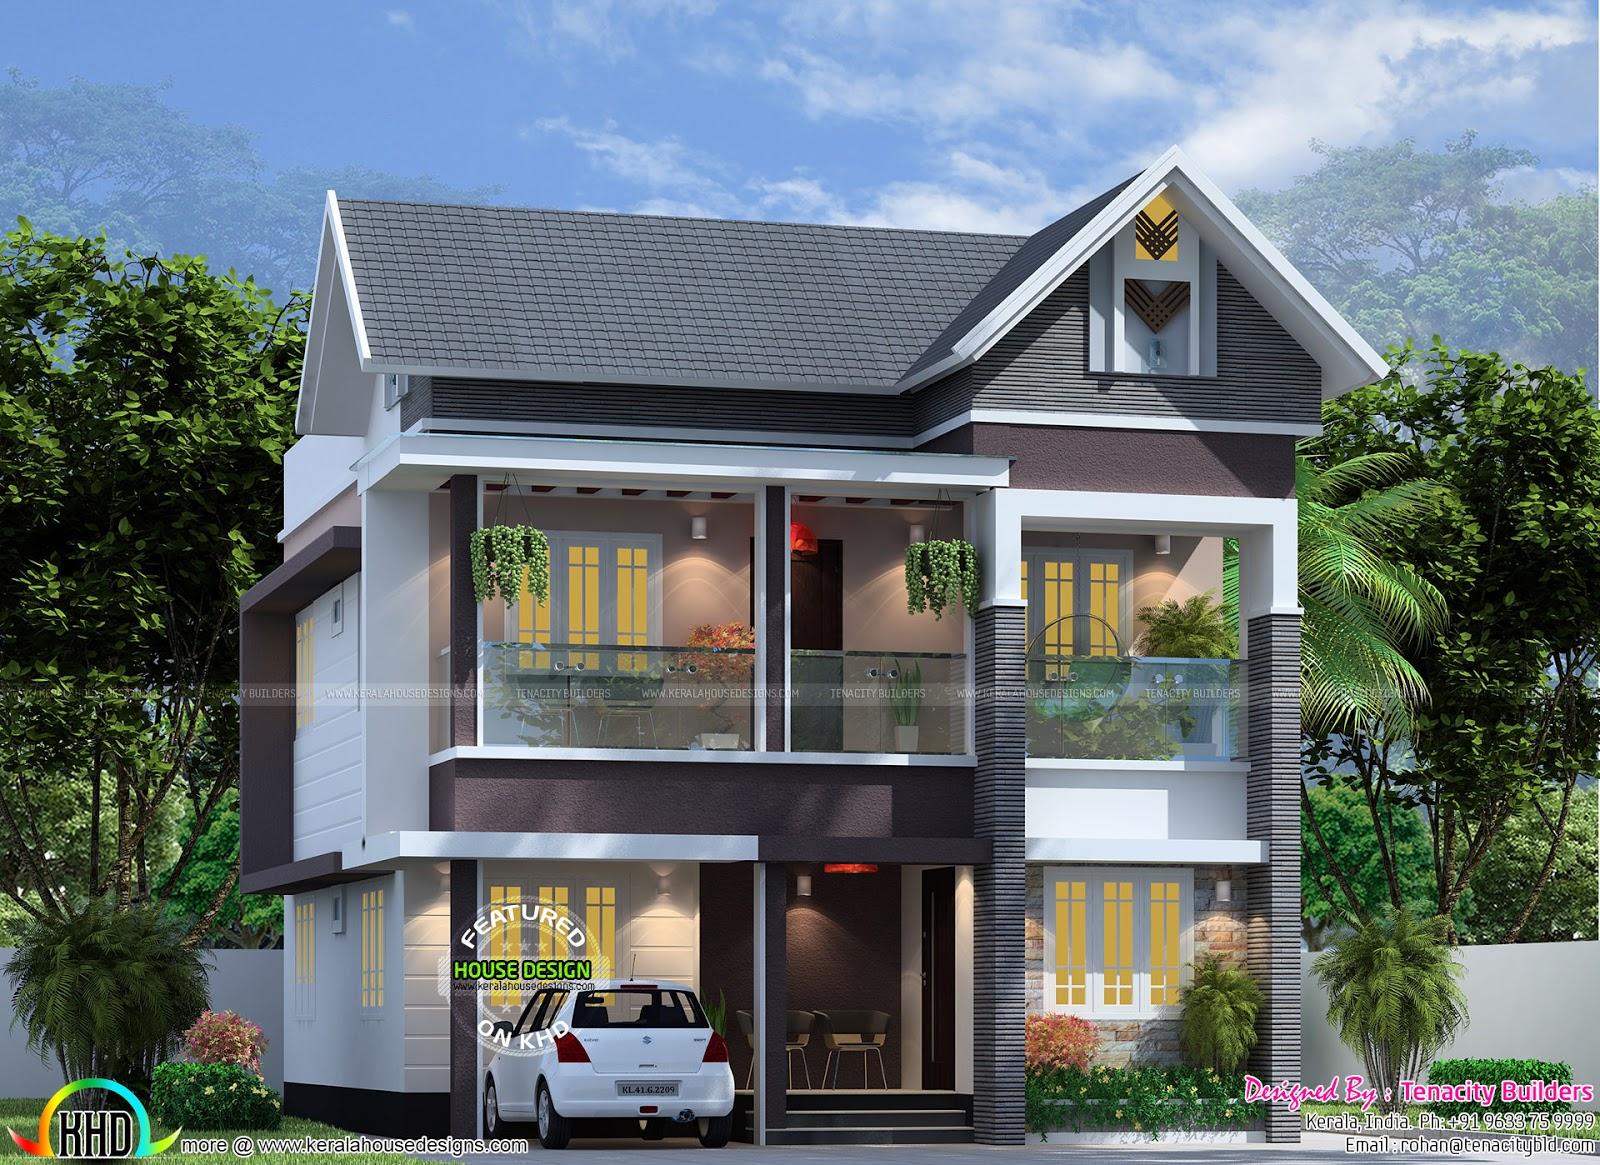 4 Bedroom 1830 Sq Ft Modern Sloped Roof Home Kerala Home